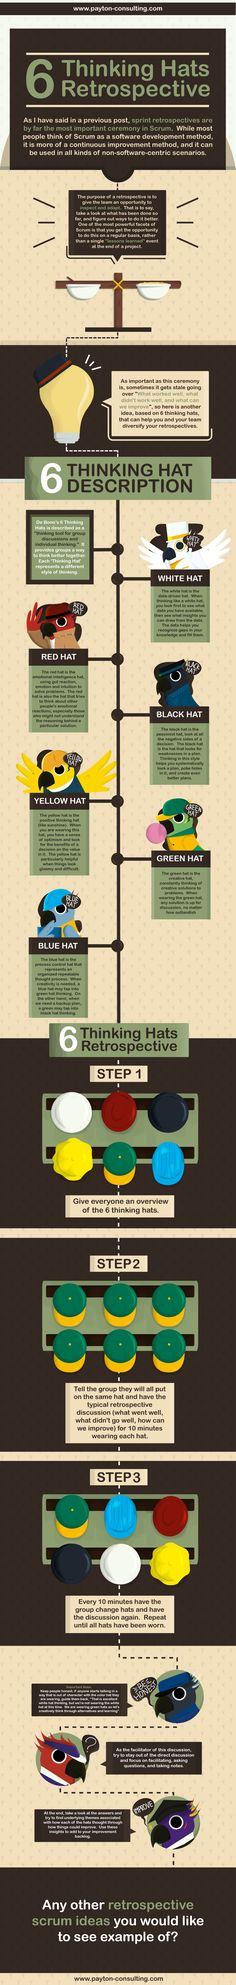 6 Thinking Hats Retrospective #agile #scrum #retrospective